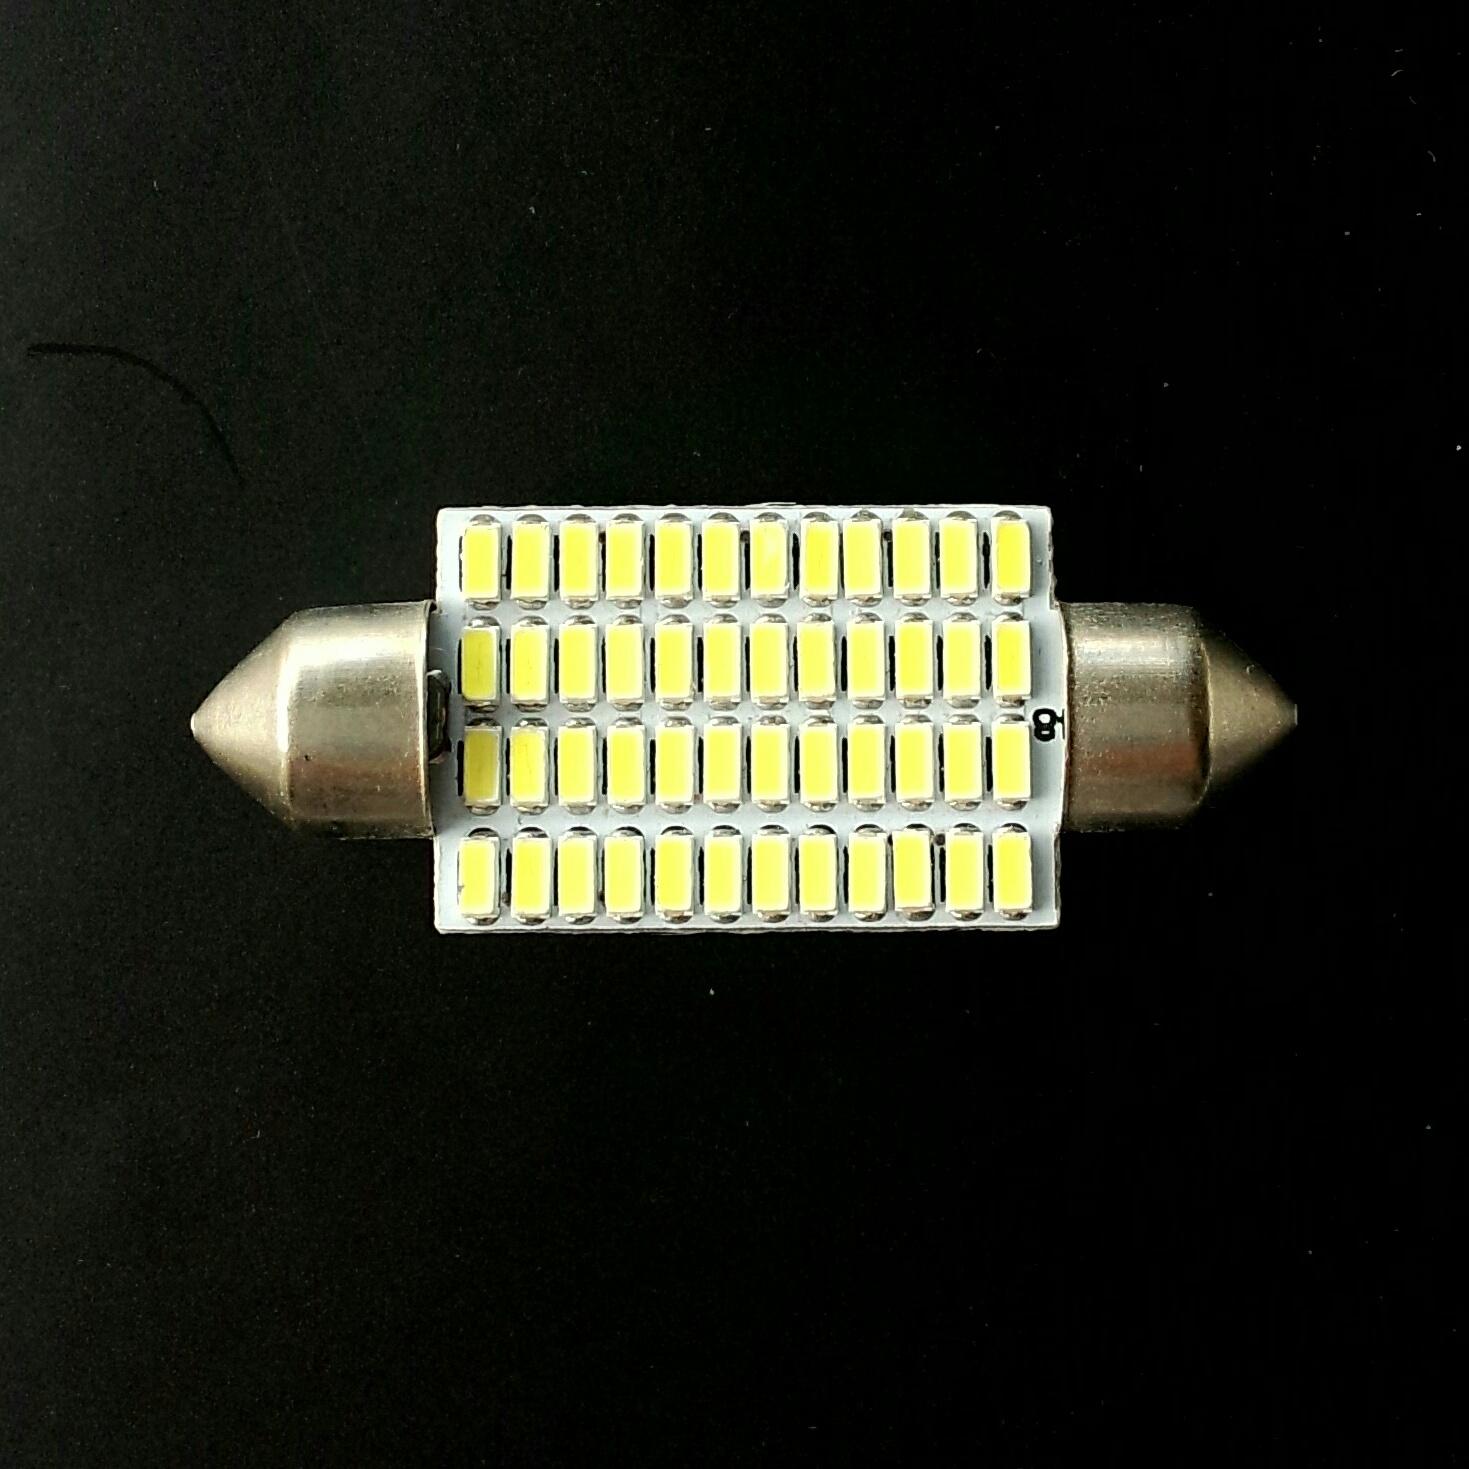 Festoon 16x41 LED 48smd 3014 SV8,5 12v 41мм драйвер 550Lm